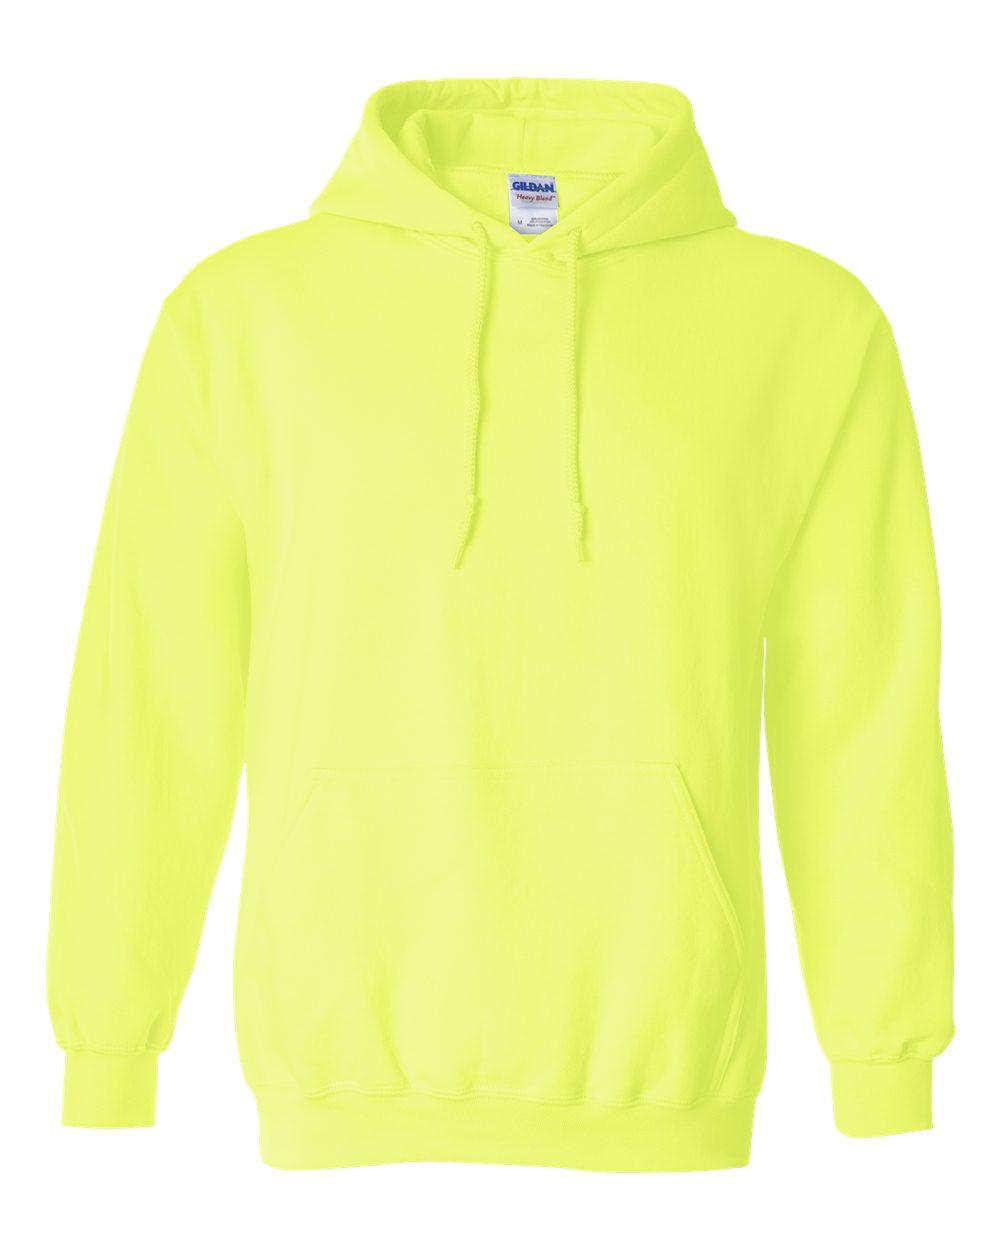 Gildan-Mens-Blank-Hoodie-Heavy-Blend-Hooded-Sweatshirt-Solid-18500-up-to-5XL thumbnail 80